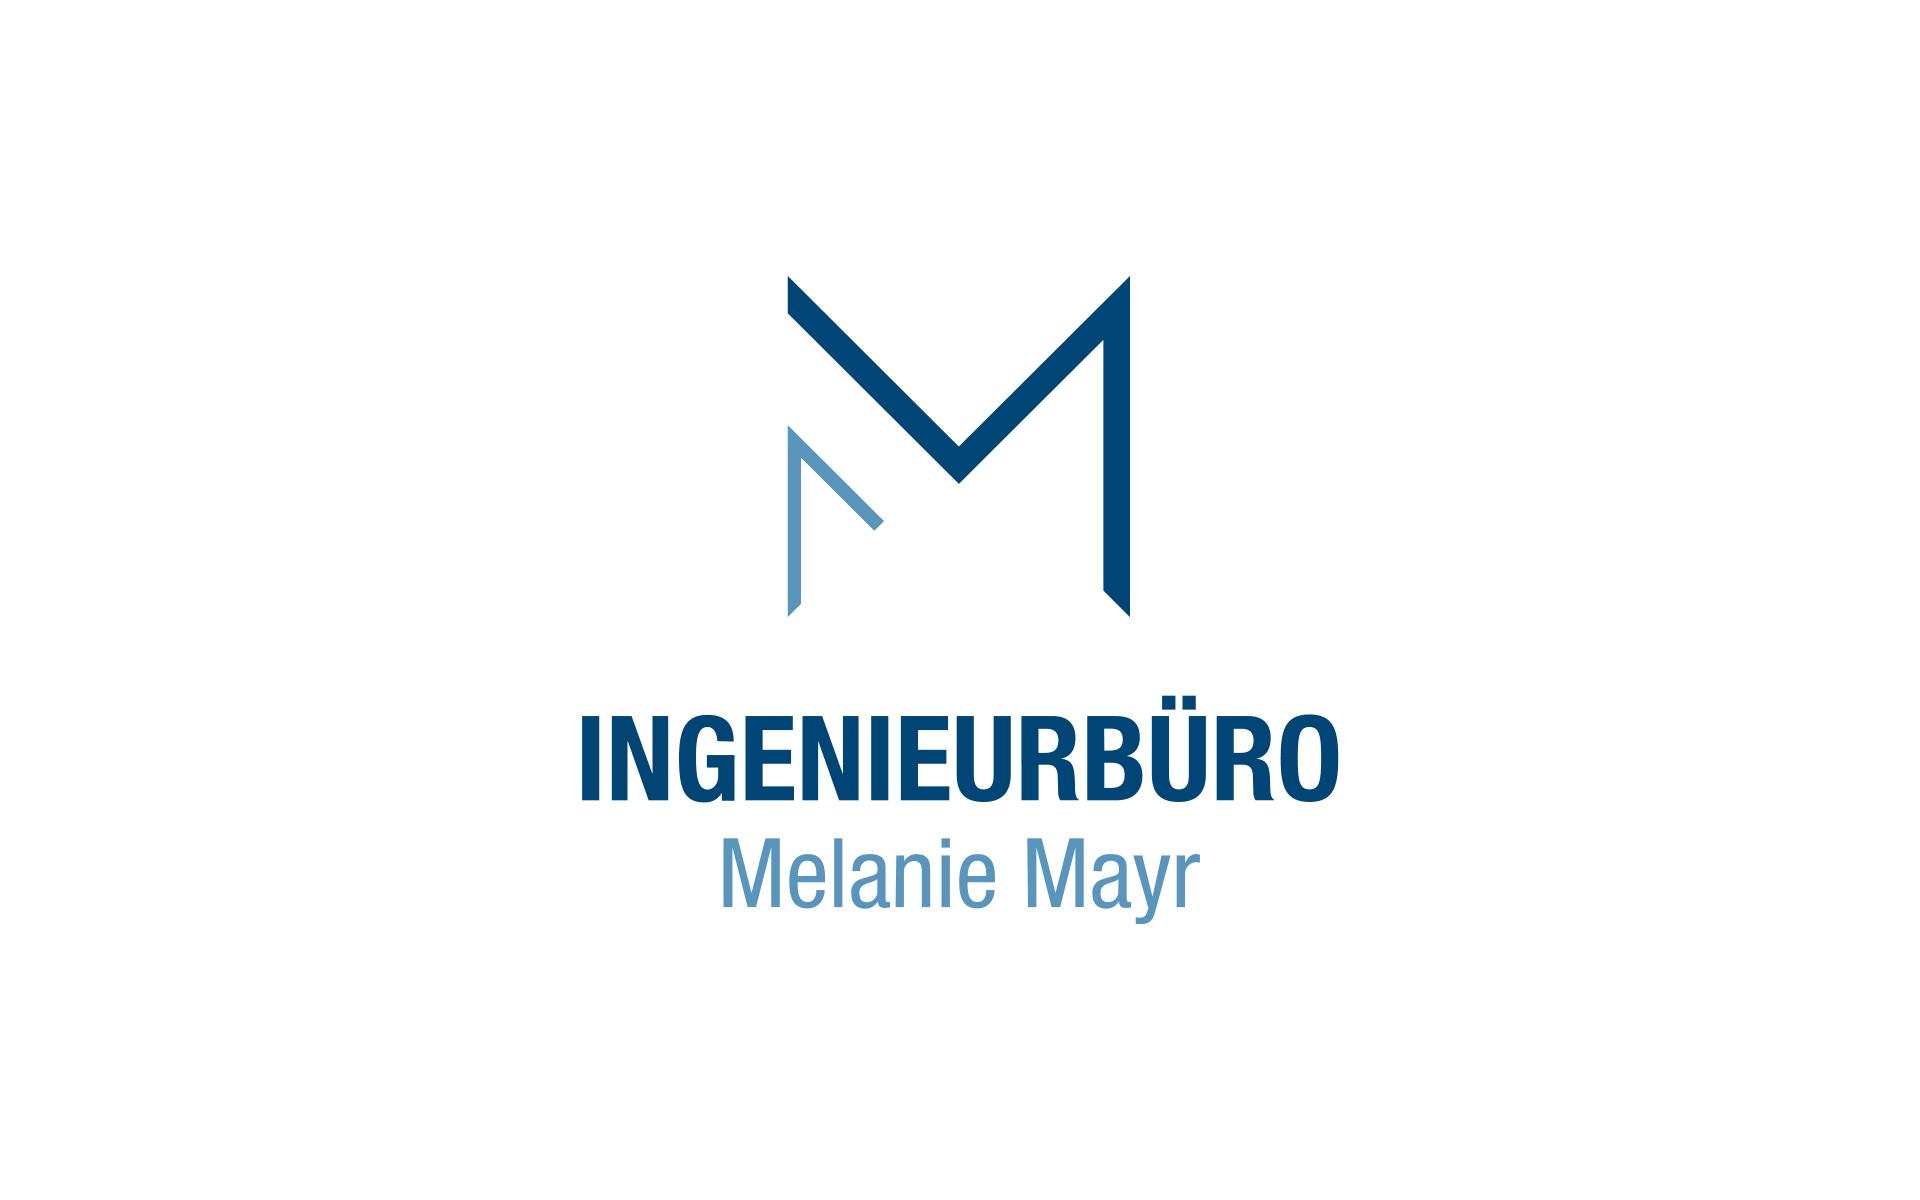 maxfath-ingenieurbuero-melanie-mayr-mering-branding-logo-vertikal